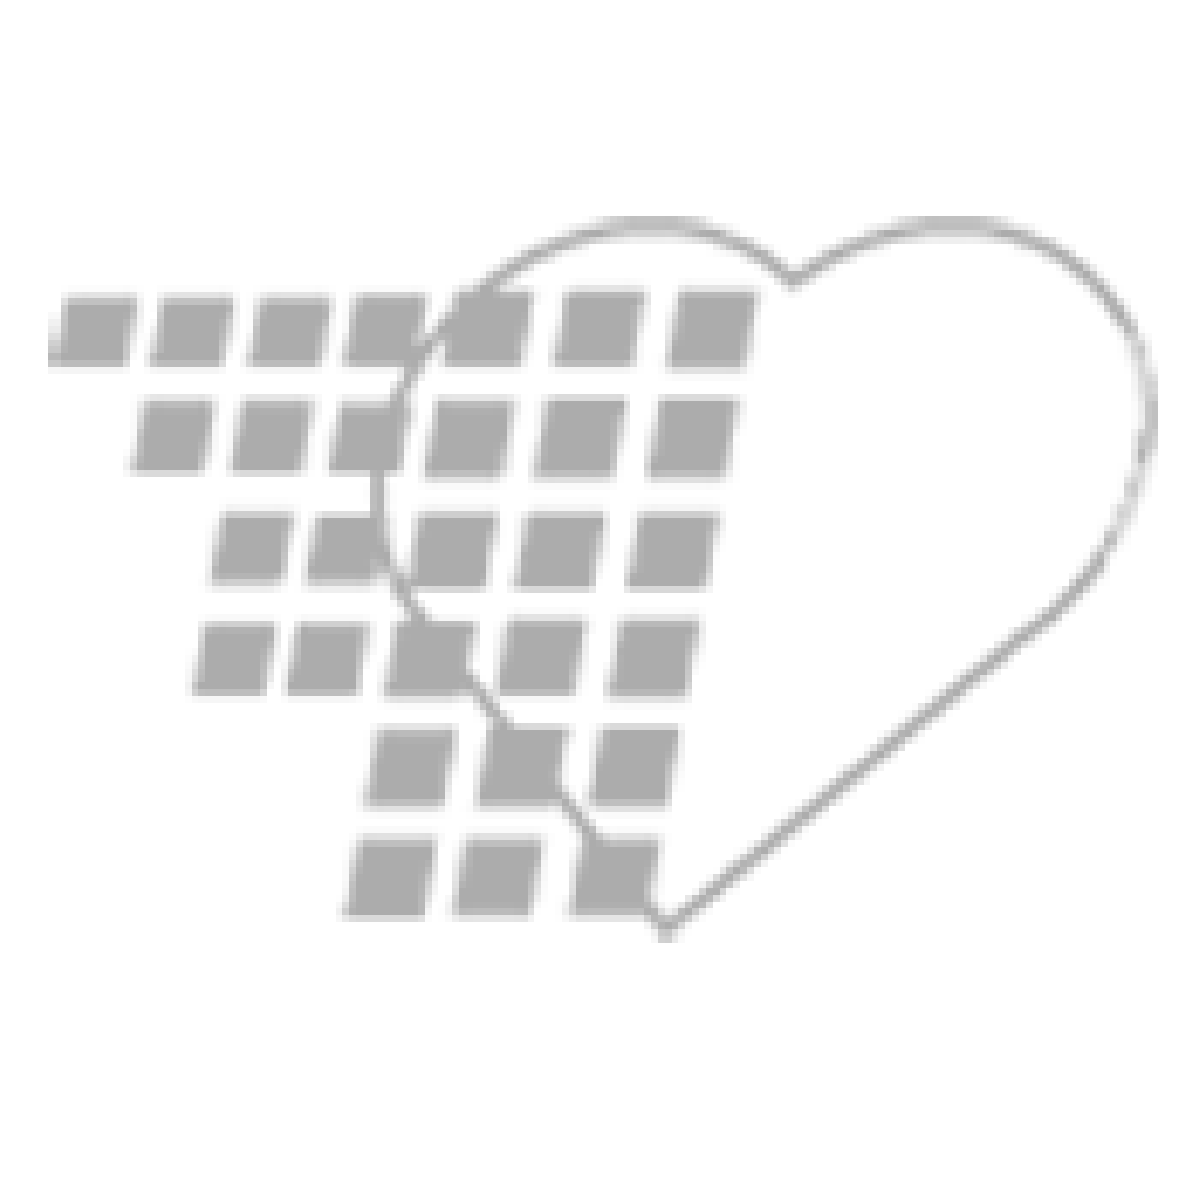 06-21-8661 BD™ Vacutainer™ Reg Plus Plastic EDTA - 6 mL Draw with Lavender Conventional Closure